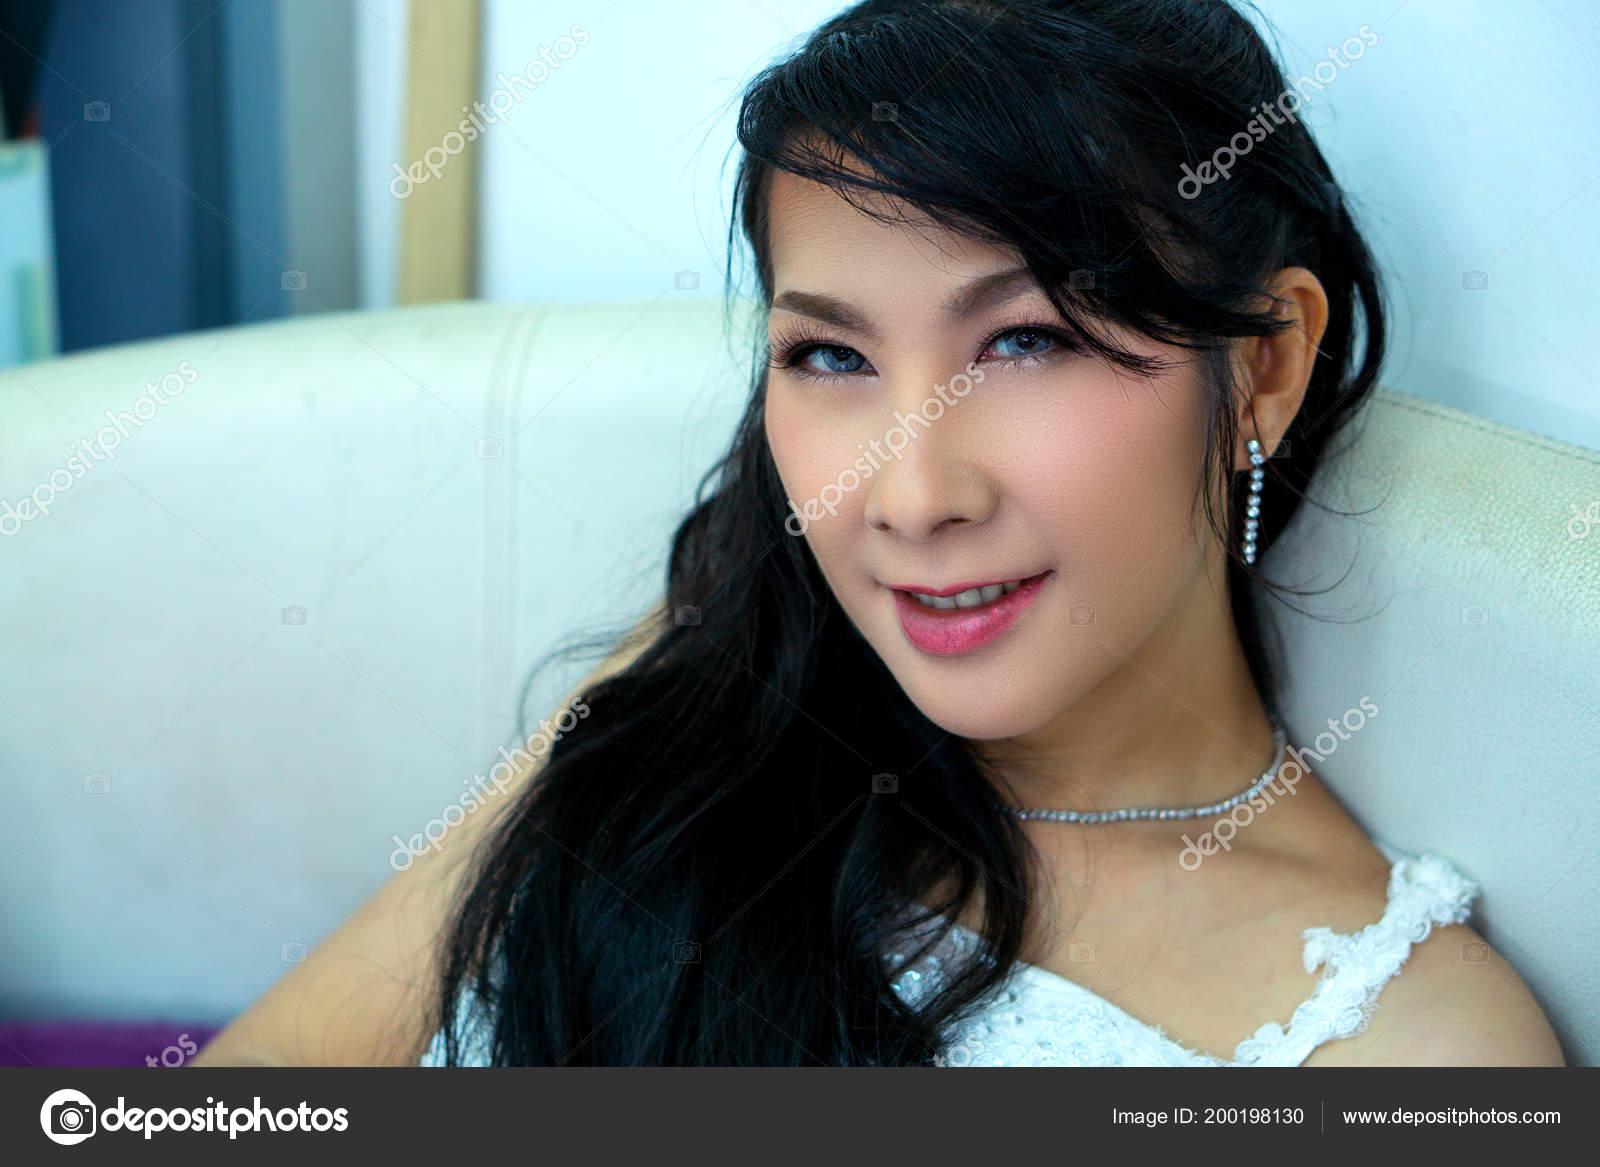 Irene Wearing Wedding Dress Pre Wedding Shooting She Choosing Chinese Stock Photo C Eltonmaxim 200198130,Mermaid Wedding Wedding Dresses No Sleeves